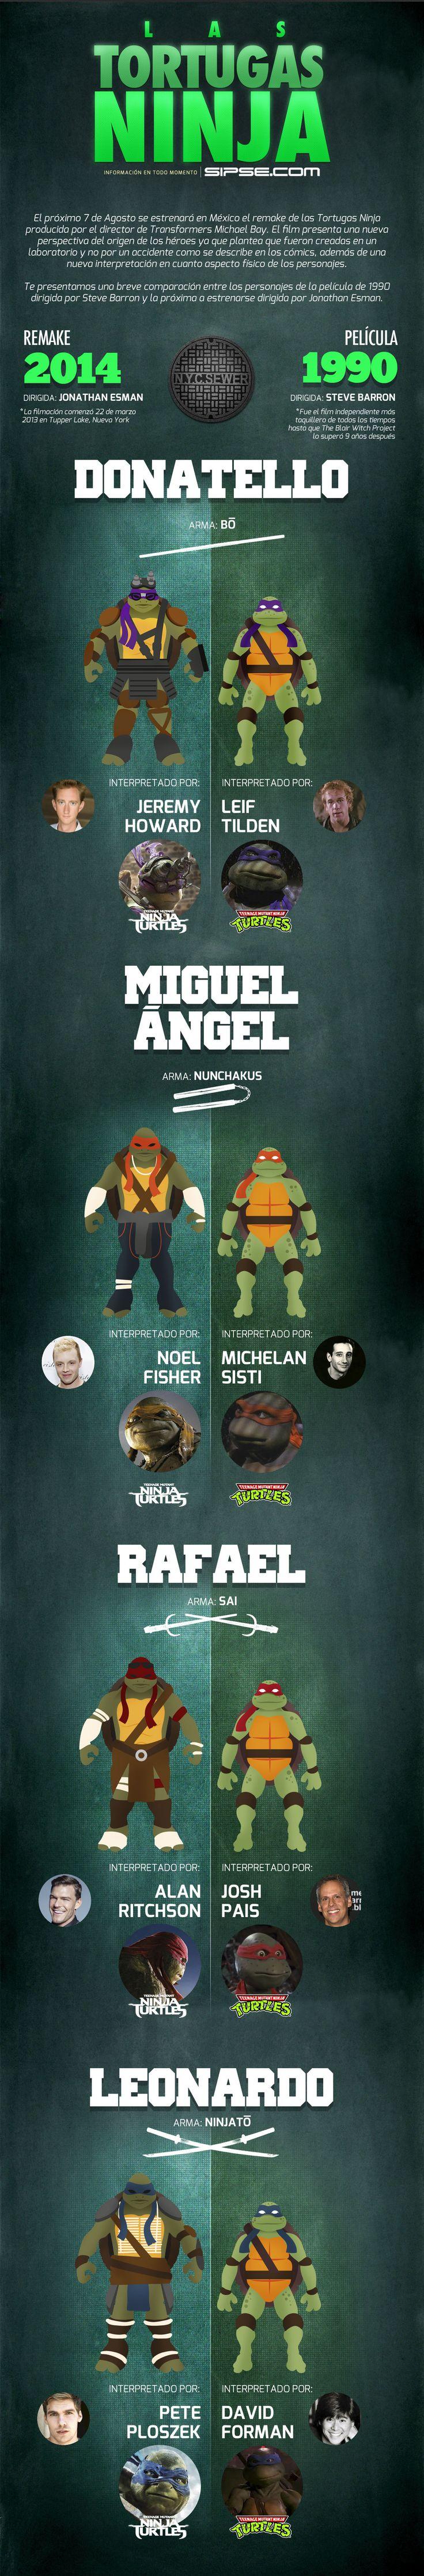 48 best newspaper layouts images on pinterest newspaper layout las tortugas ninja la nueva cinta las tortugas ninja se estrena el fandeluxe Image collections